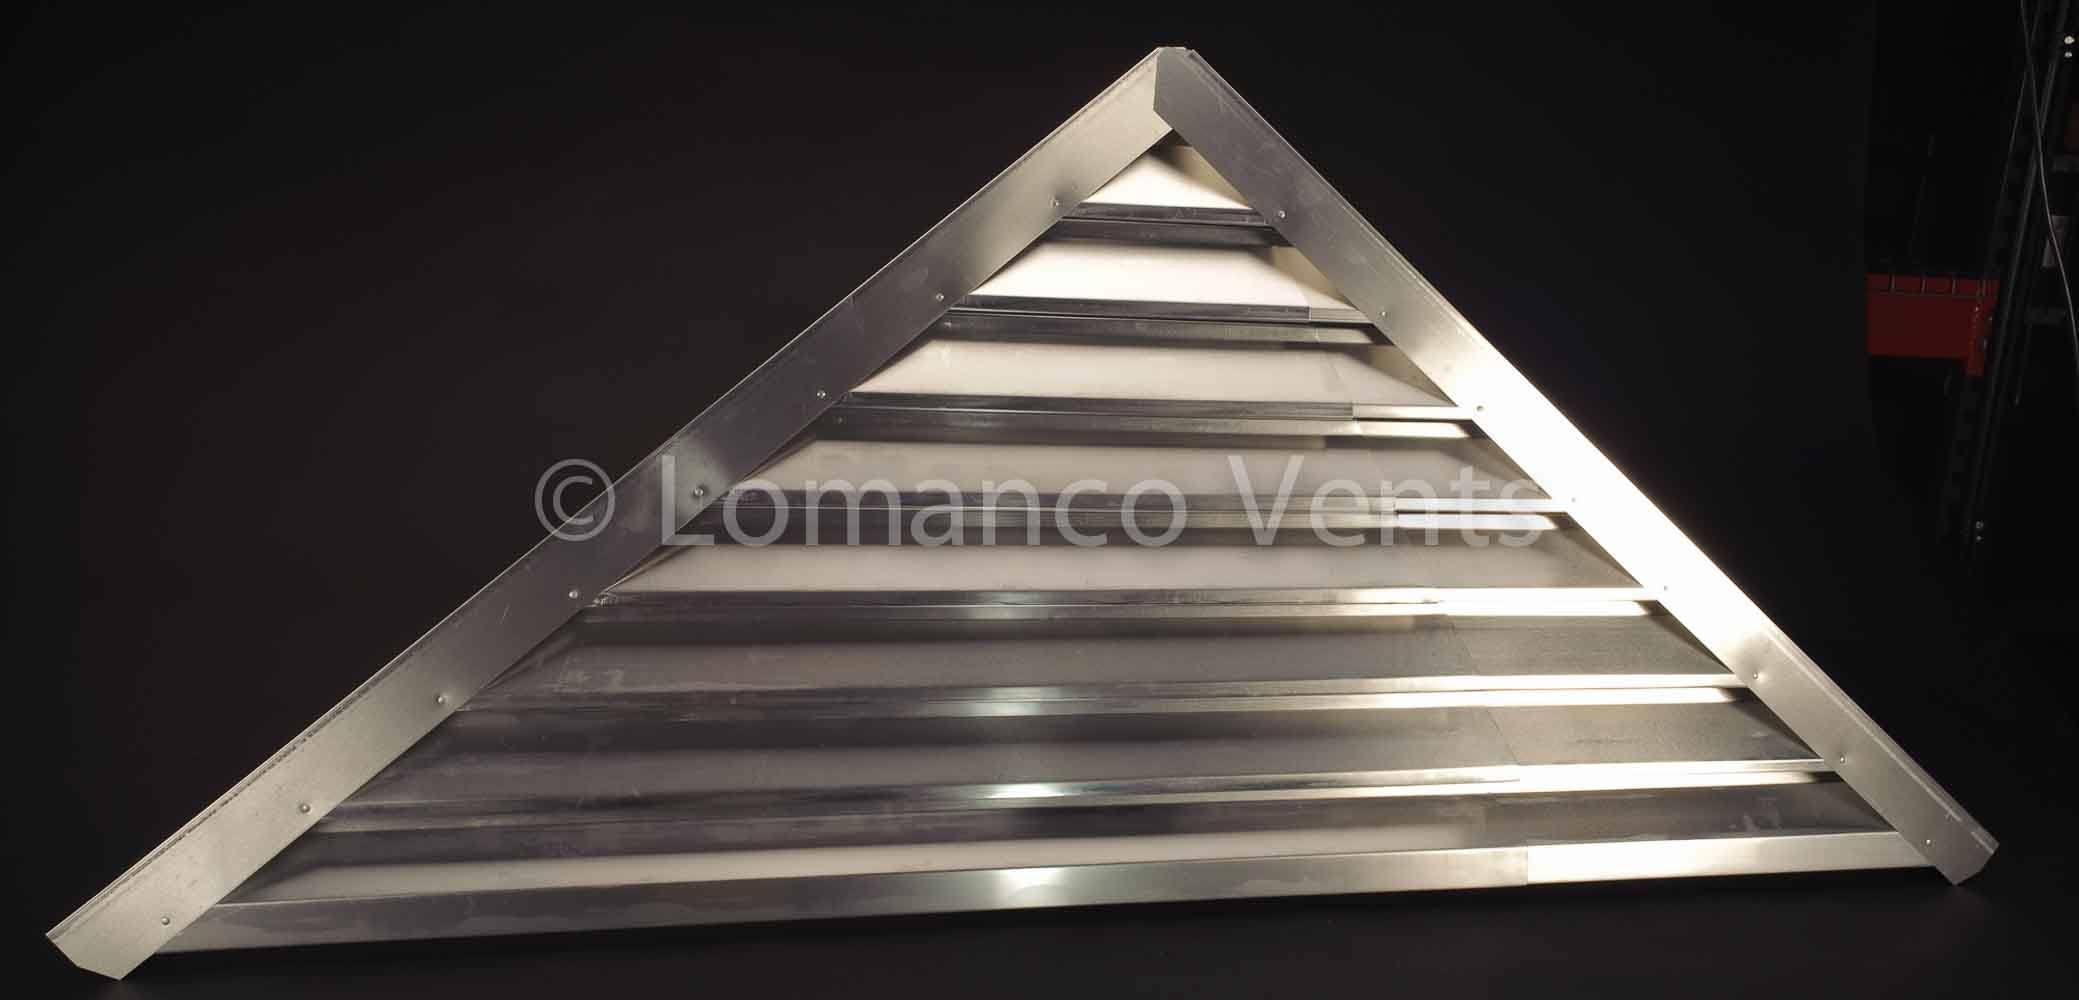 Lomanco vents gable vents for Off ridge vents